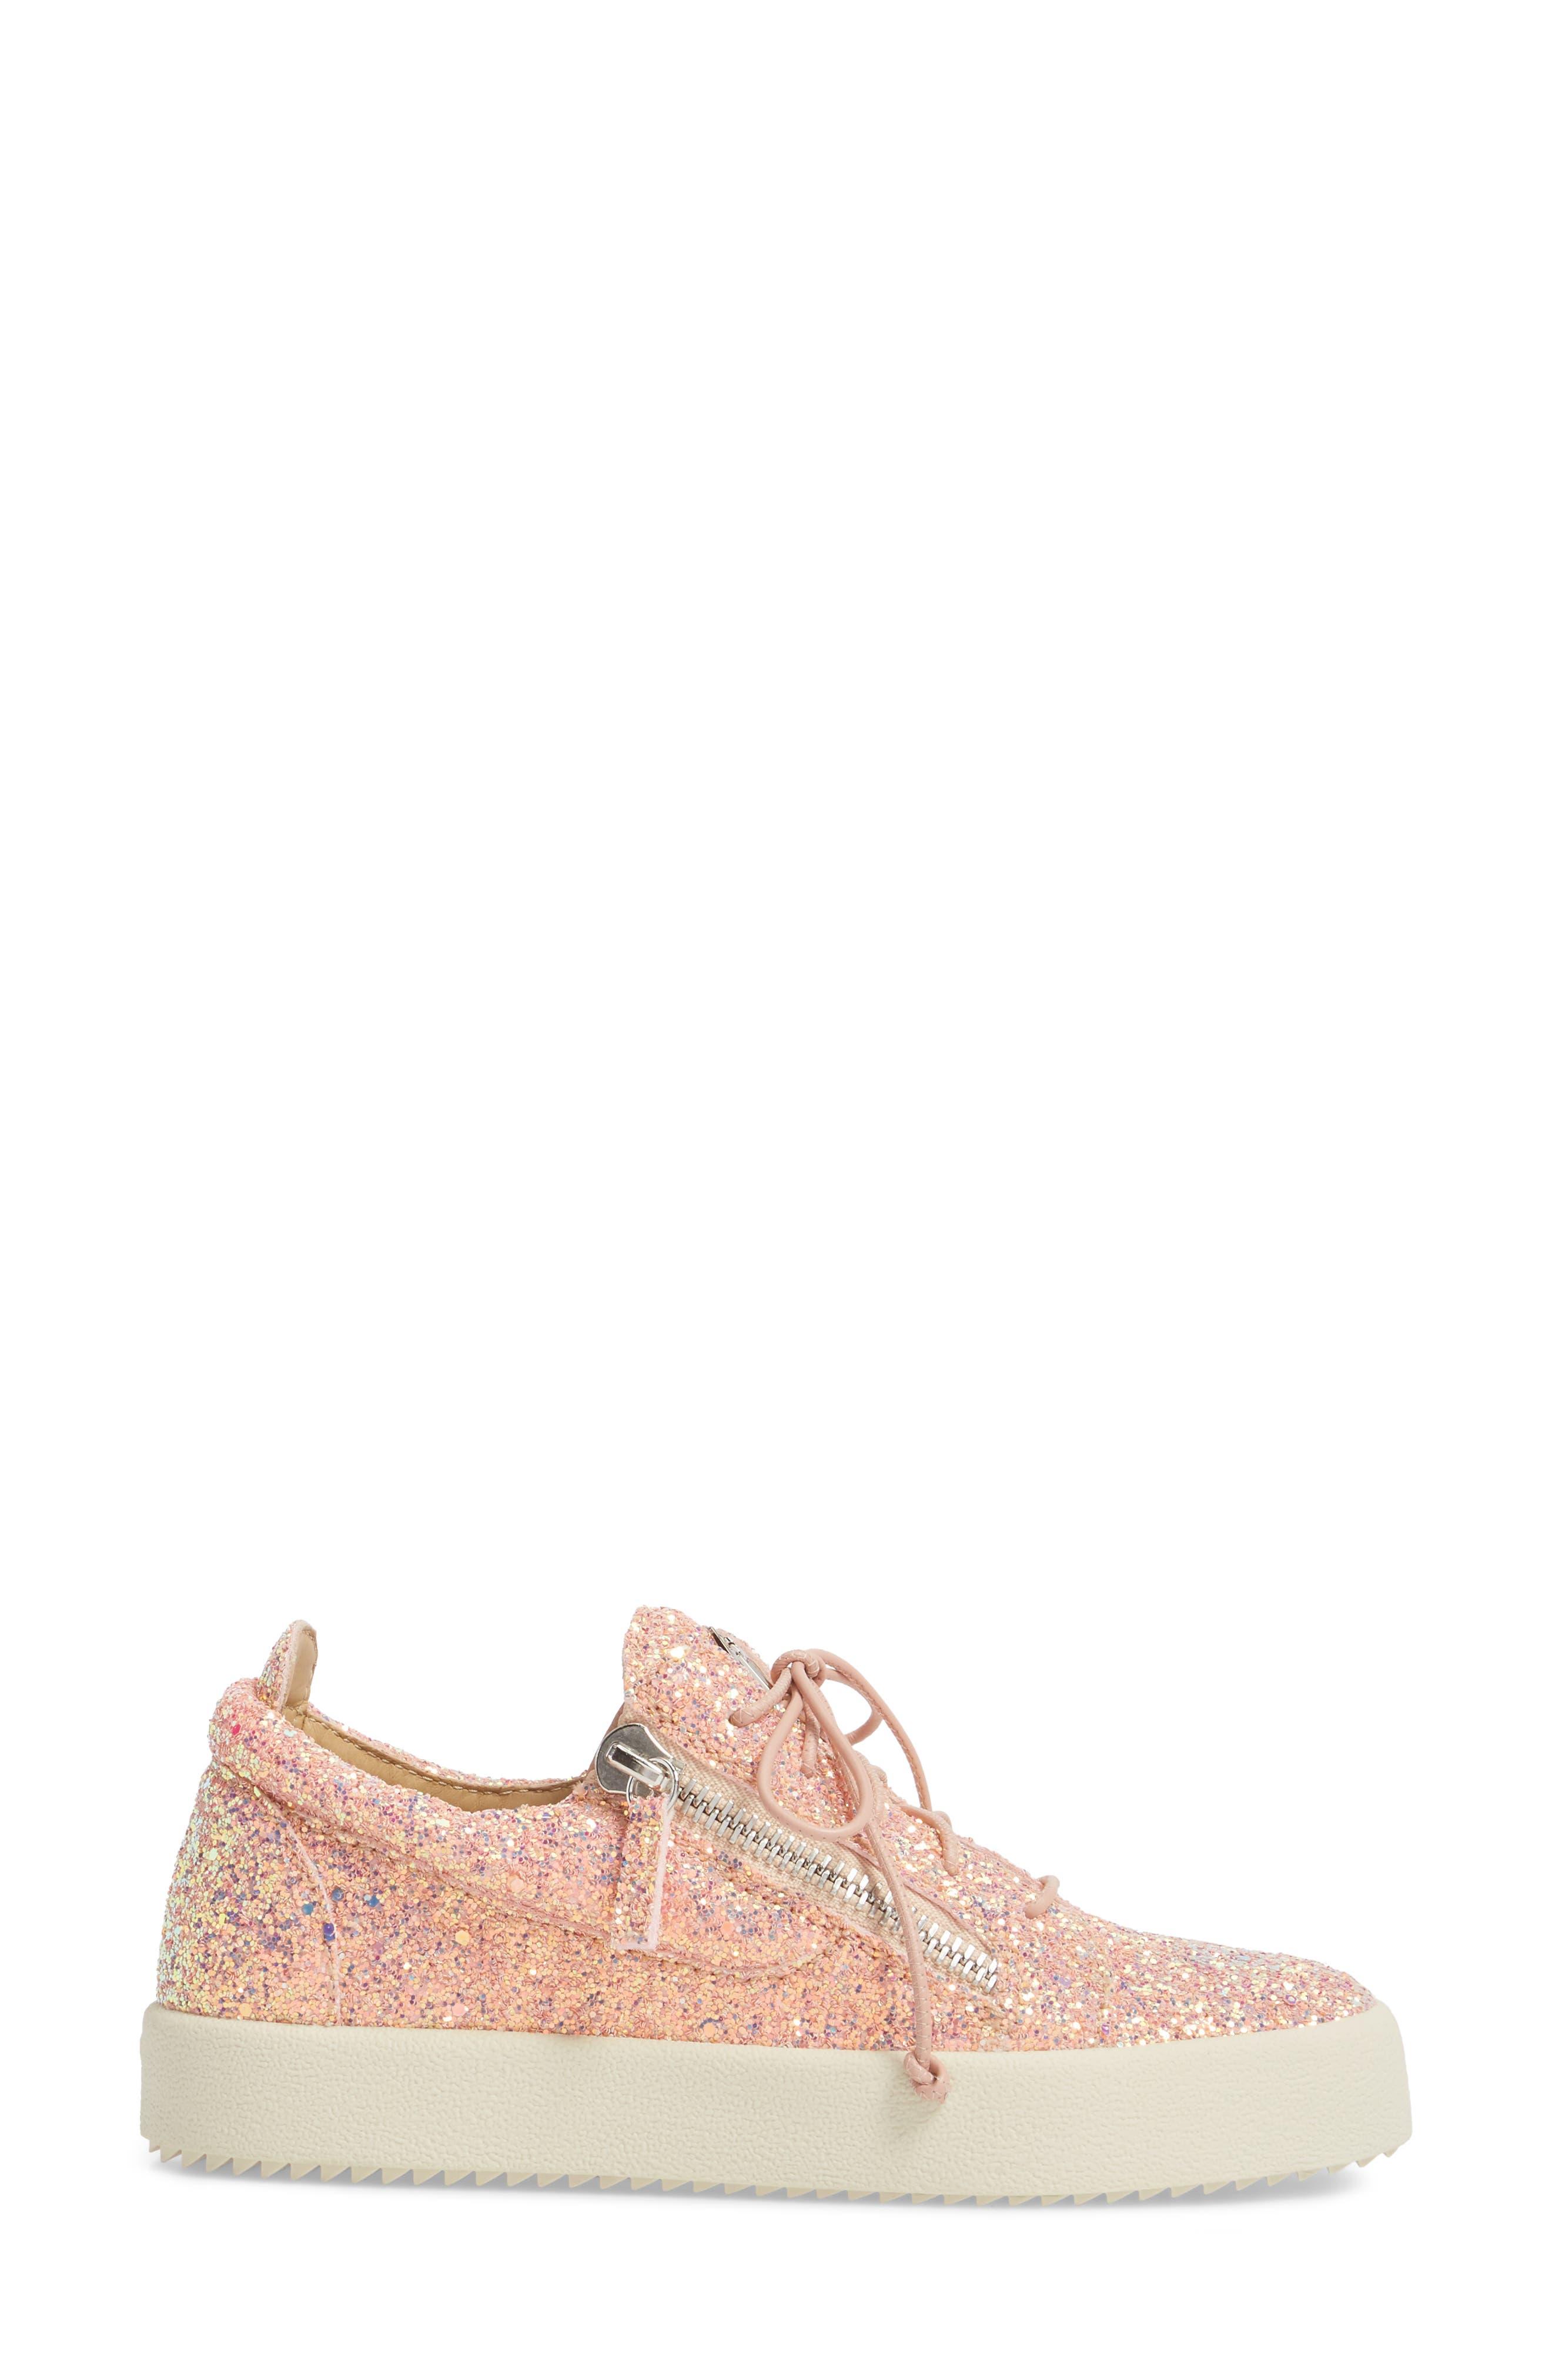 Alternate Image 3  - Giuseppe Zanotti May London Low Top Sneaker (Women)